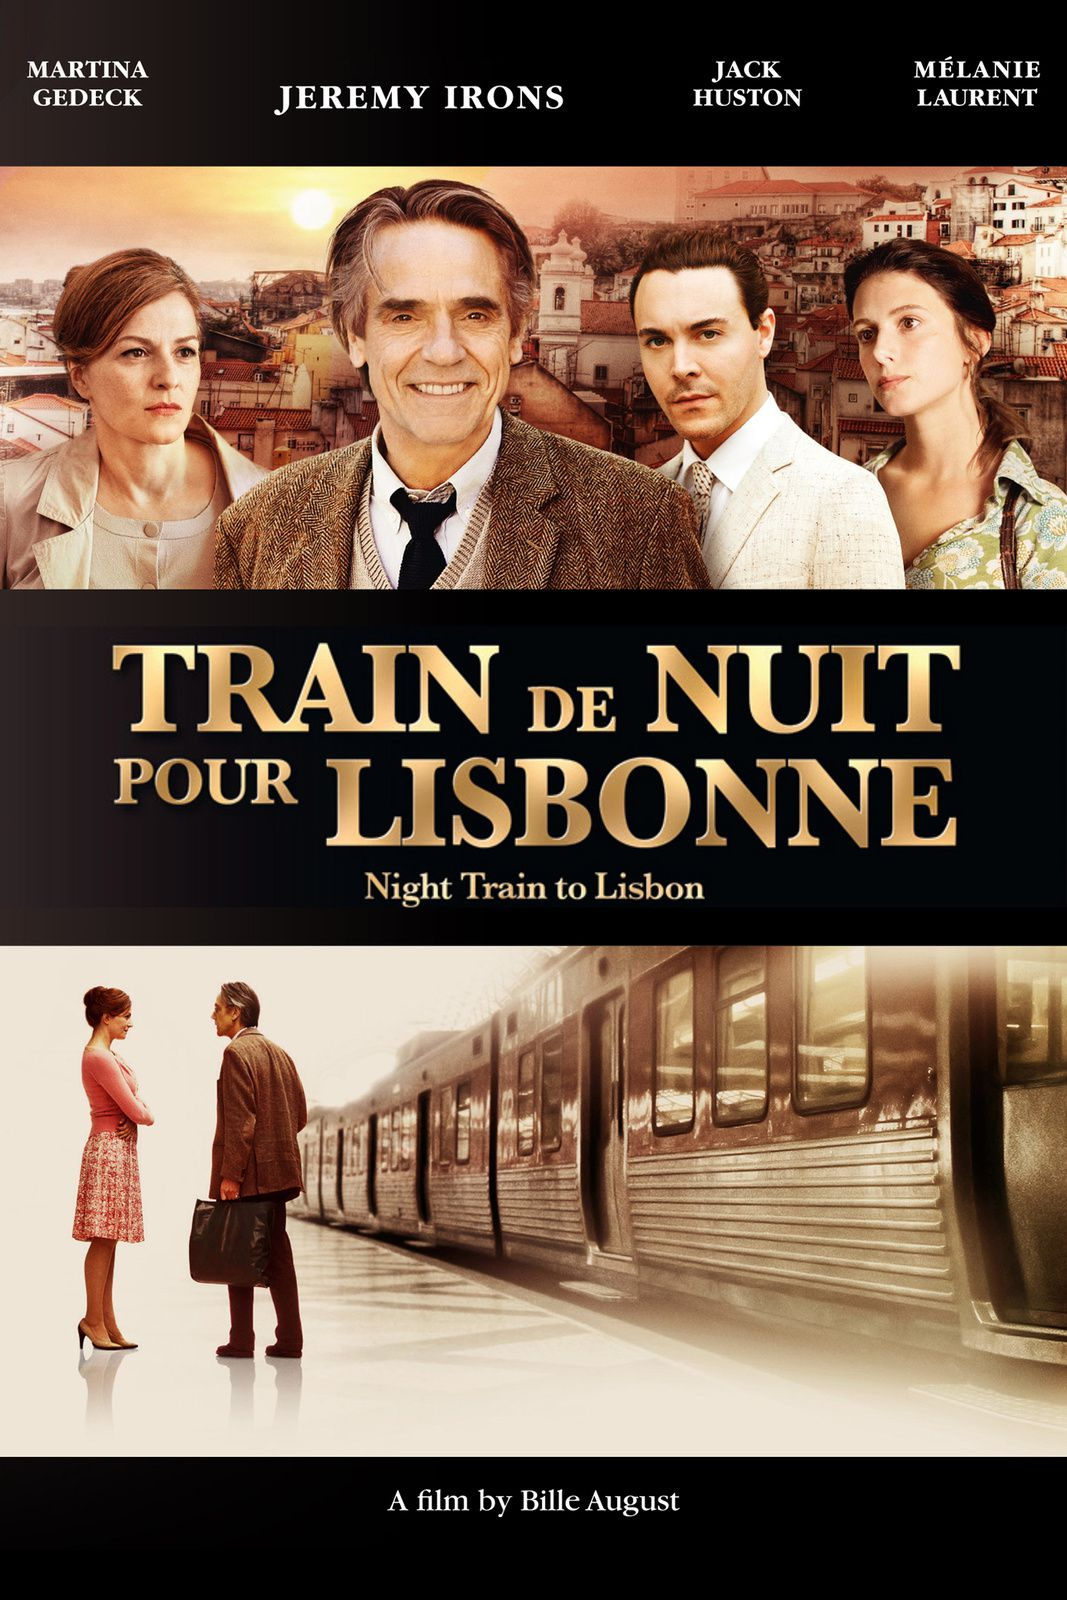 Night Train To Lisbon (BANDE ANNONCE VO 2013) avec Jeremy Irons, Mélanie Laurent